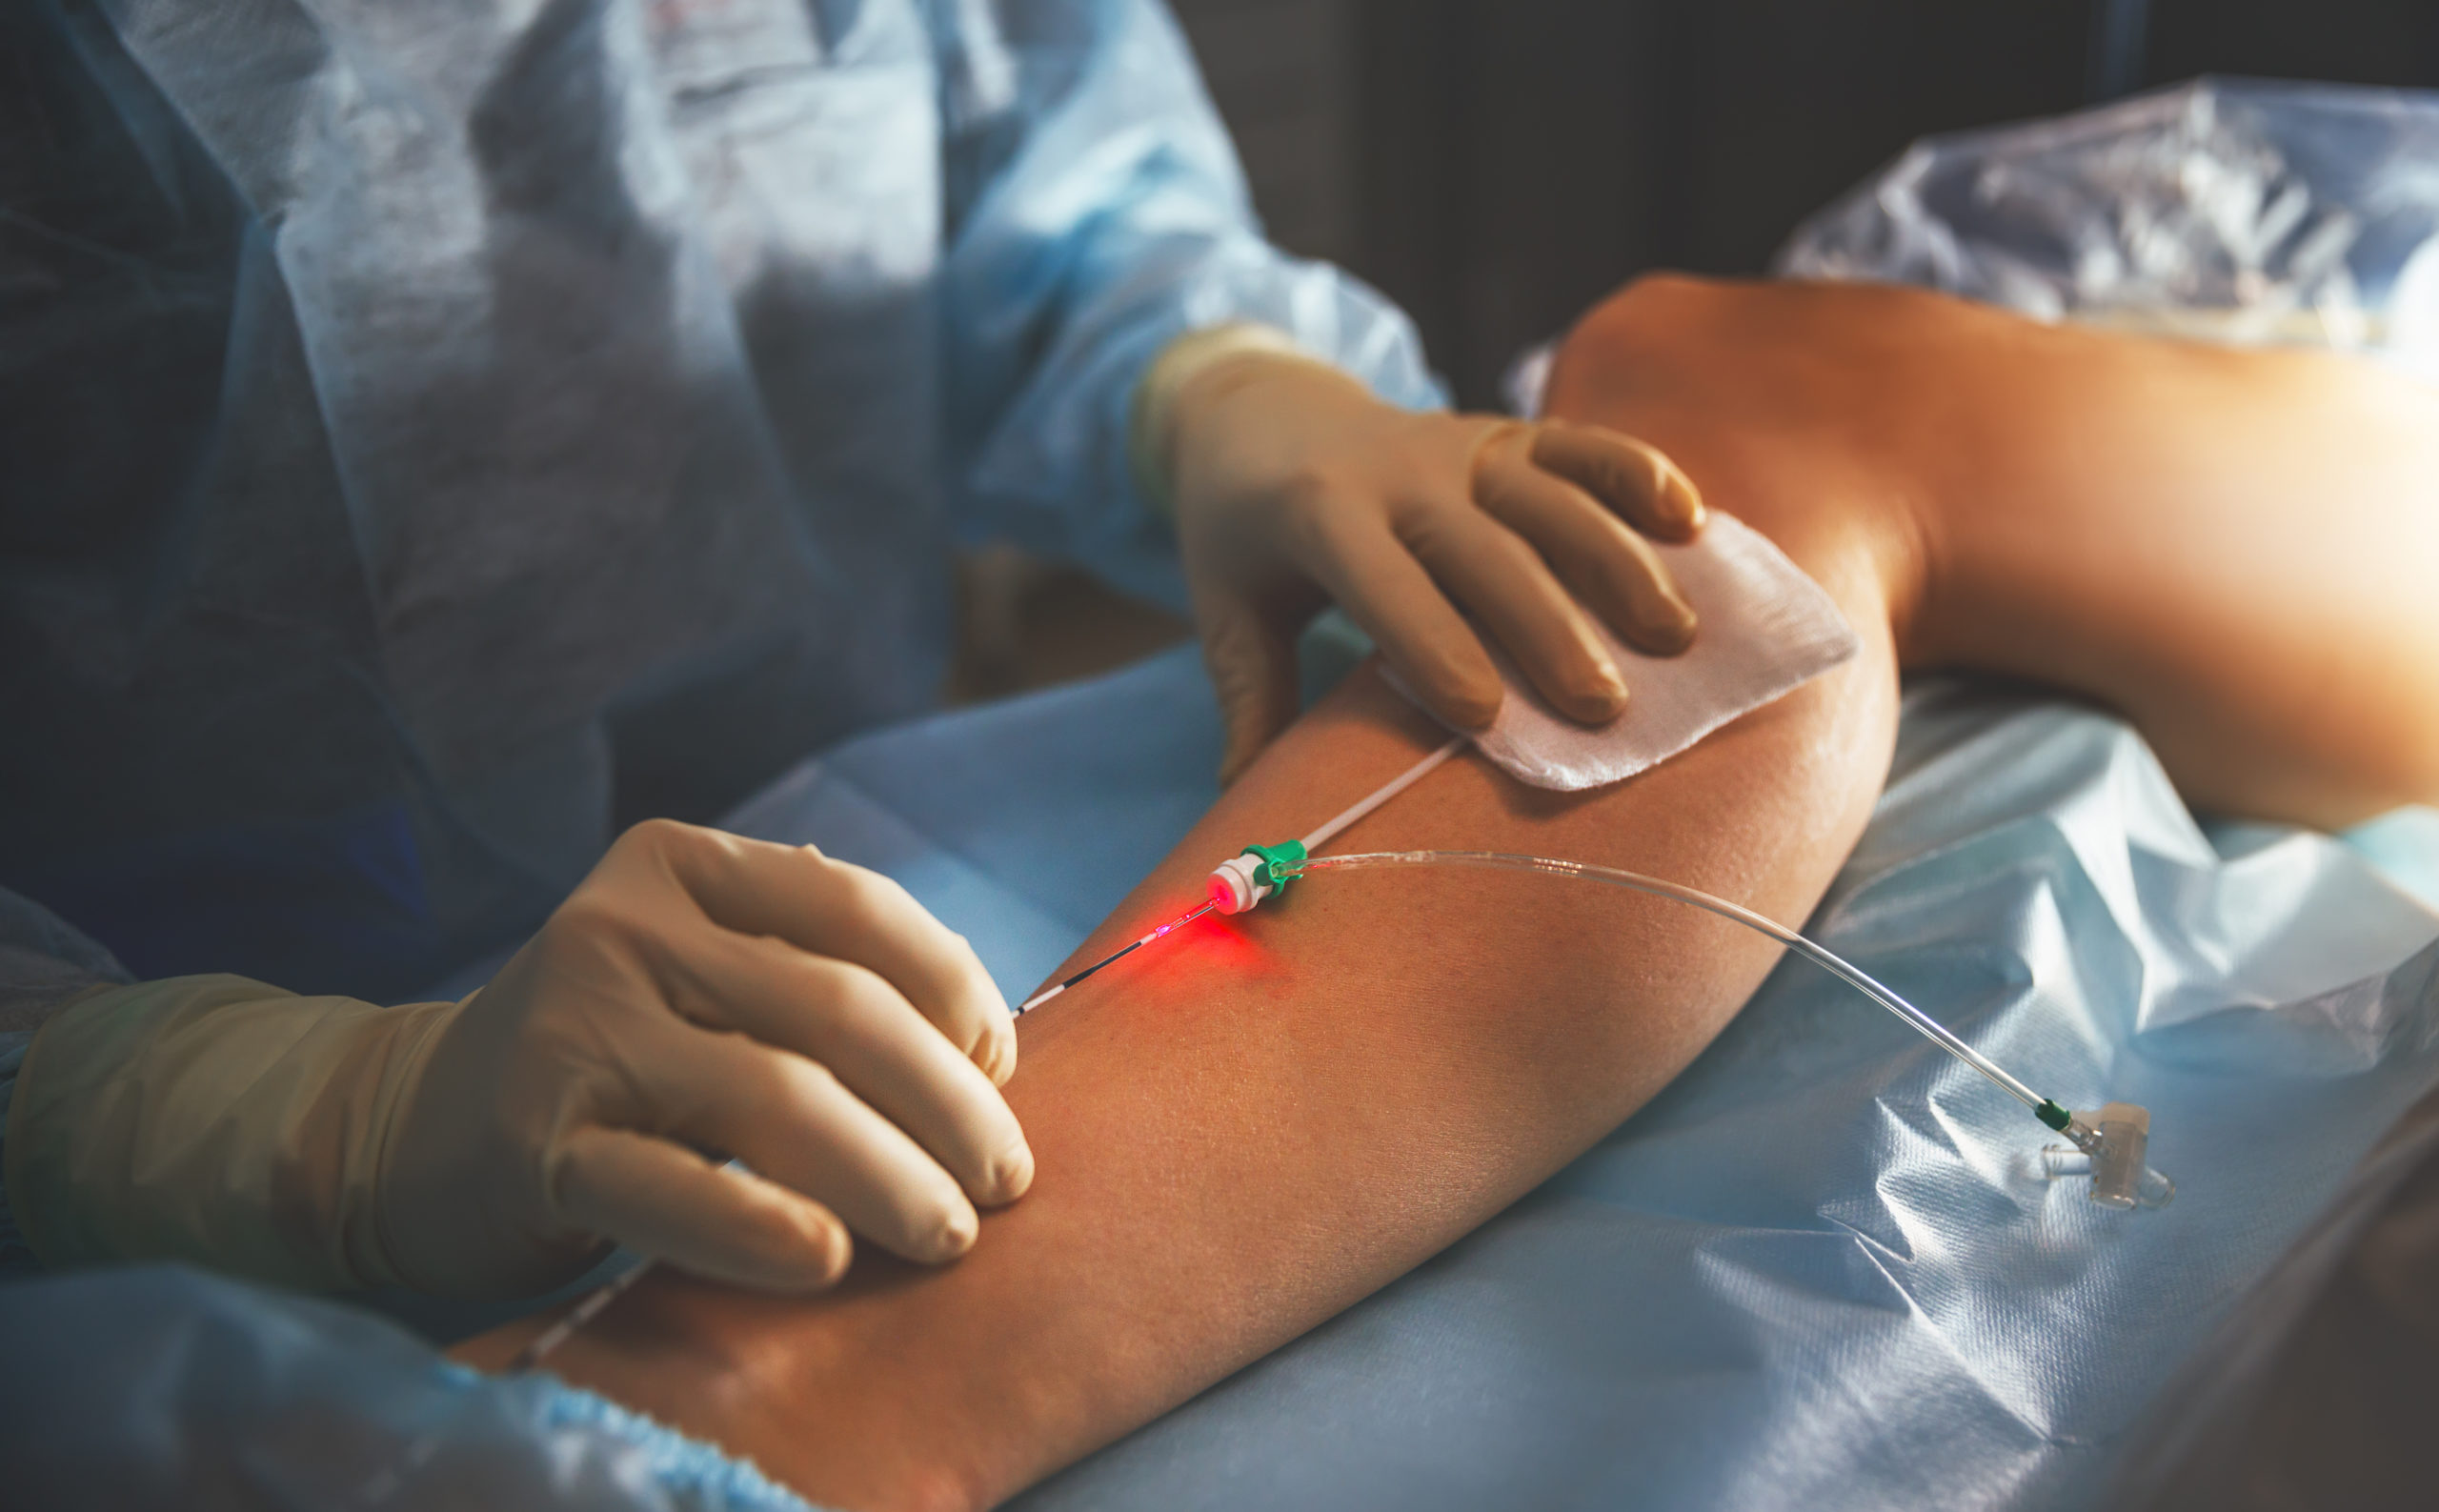 Chirurgia naczyniowa - Klinika Chirurgii Mazan - Katowice